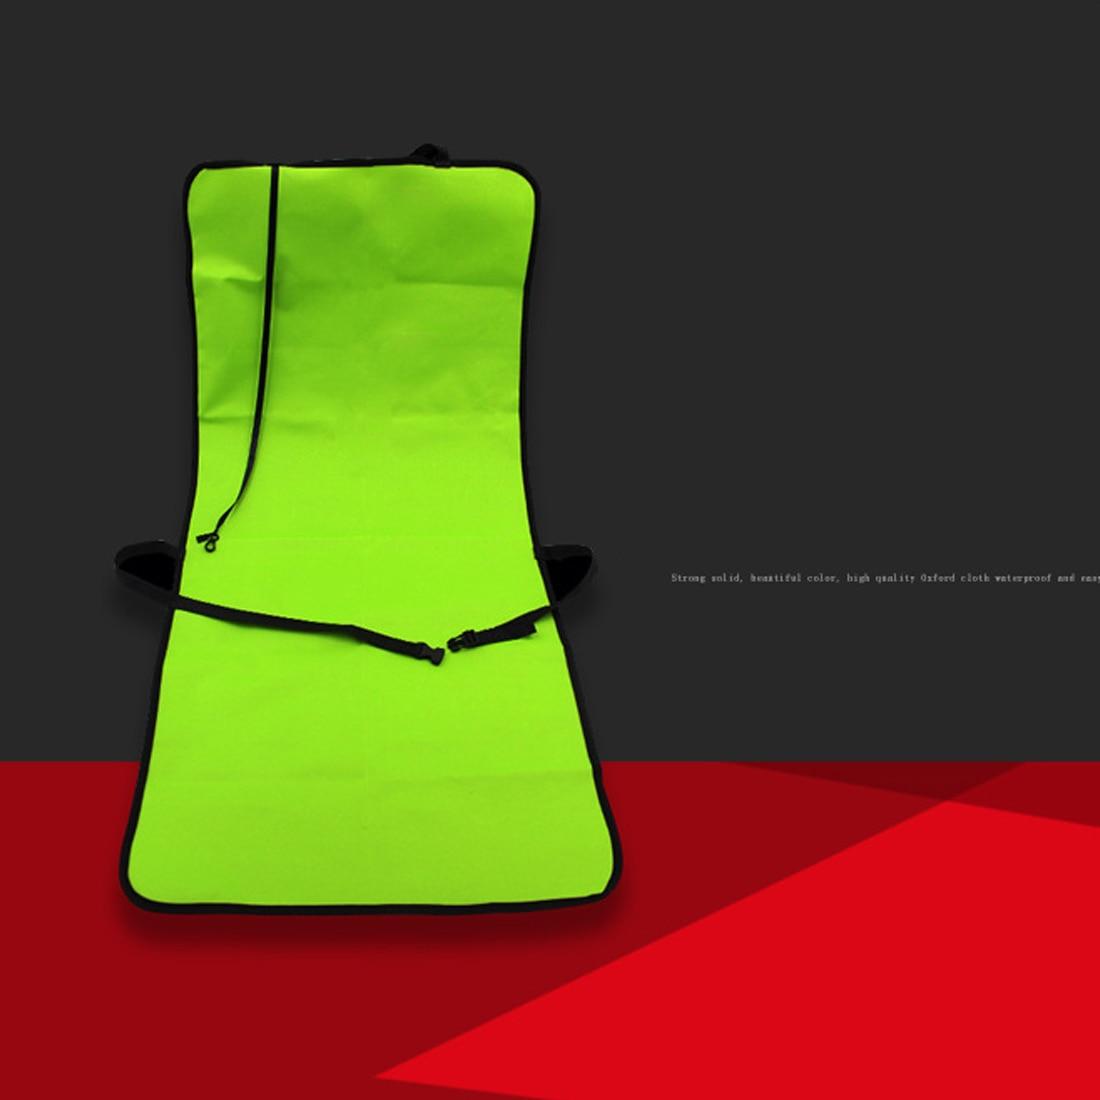 Dewtreetali BrandOxford tela asiento de coche cubierta impermeable a - Accesorios de interior de coche - foto 5